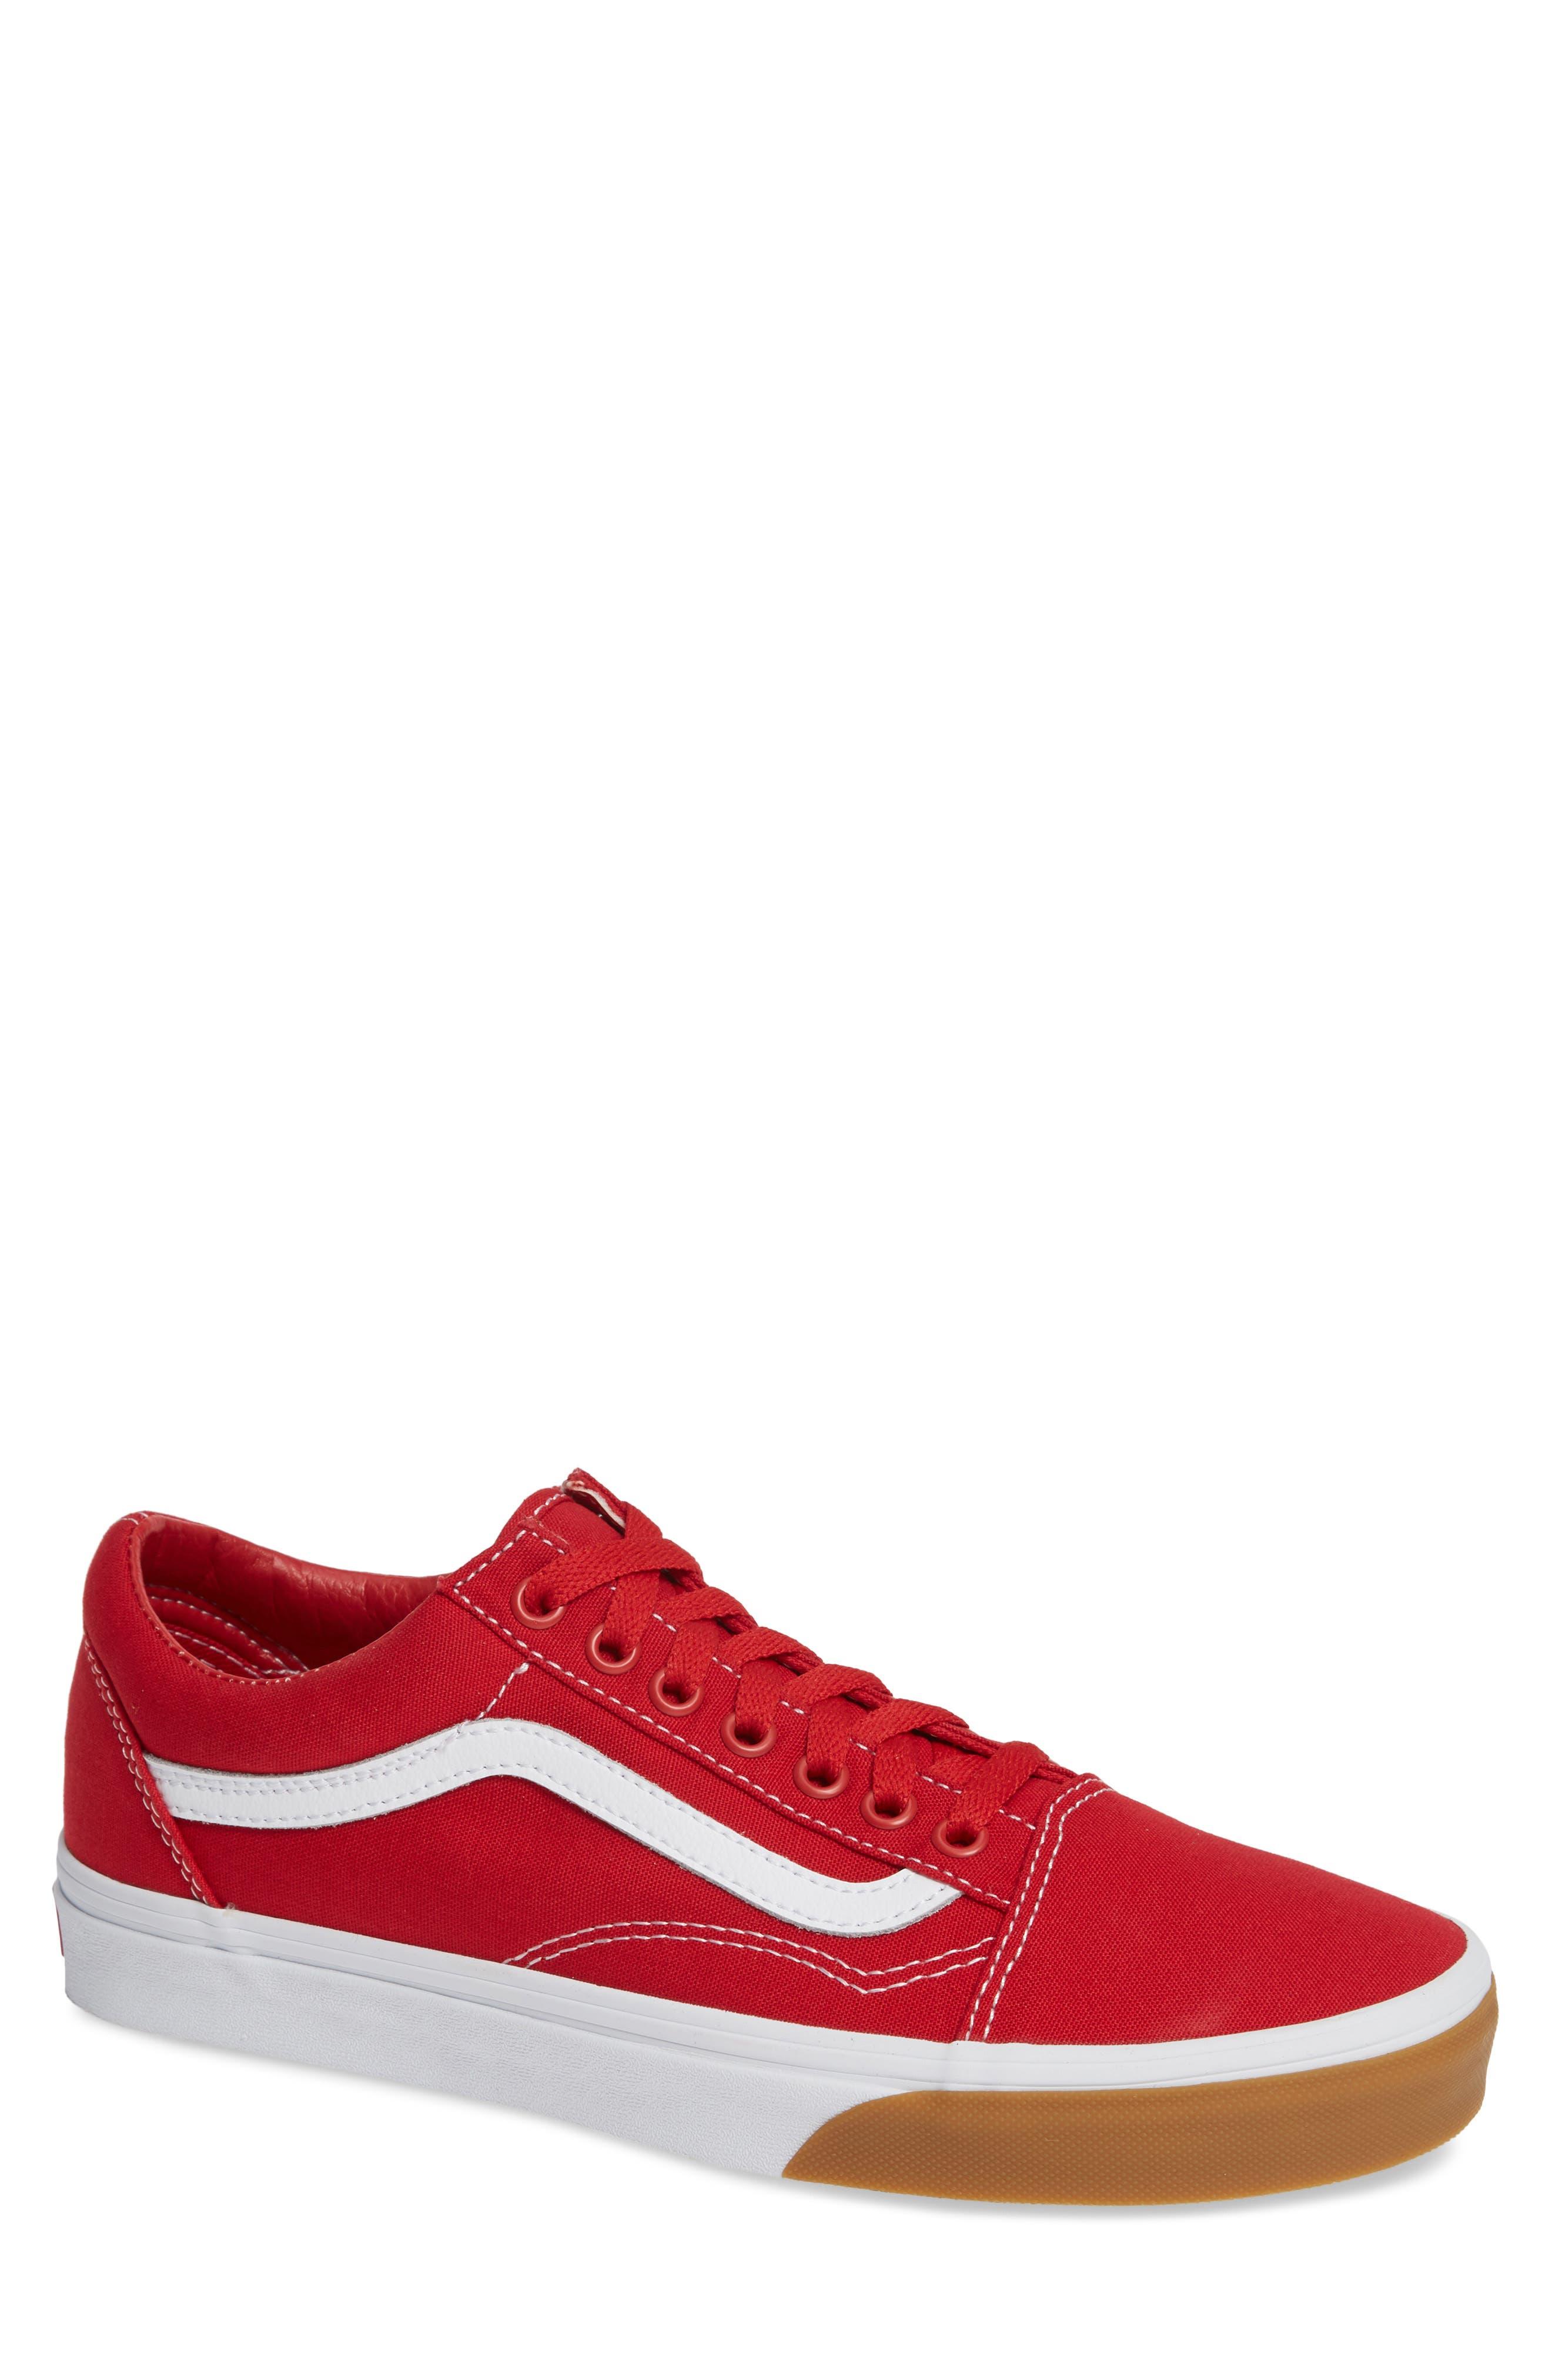 VANS,                             Gum Old Skool Sneaker,                             Main thumbnail 1, color,                             RED/ TRUE WHITE